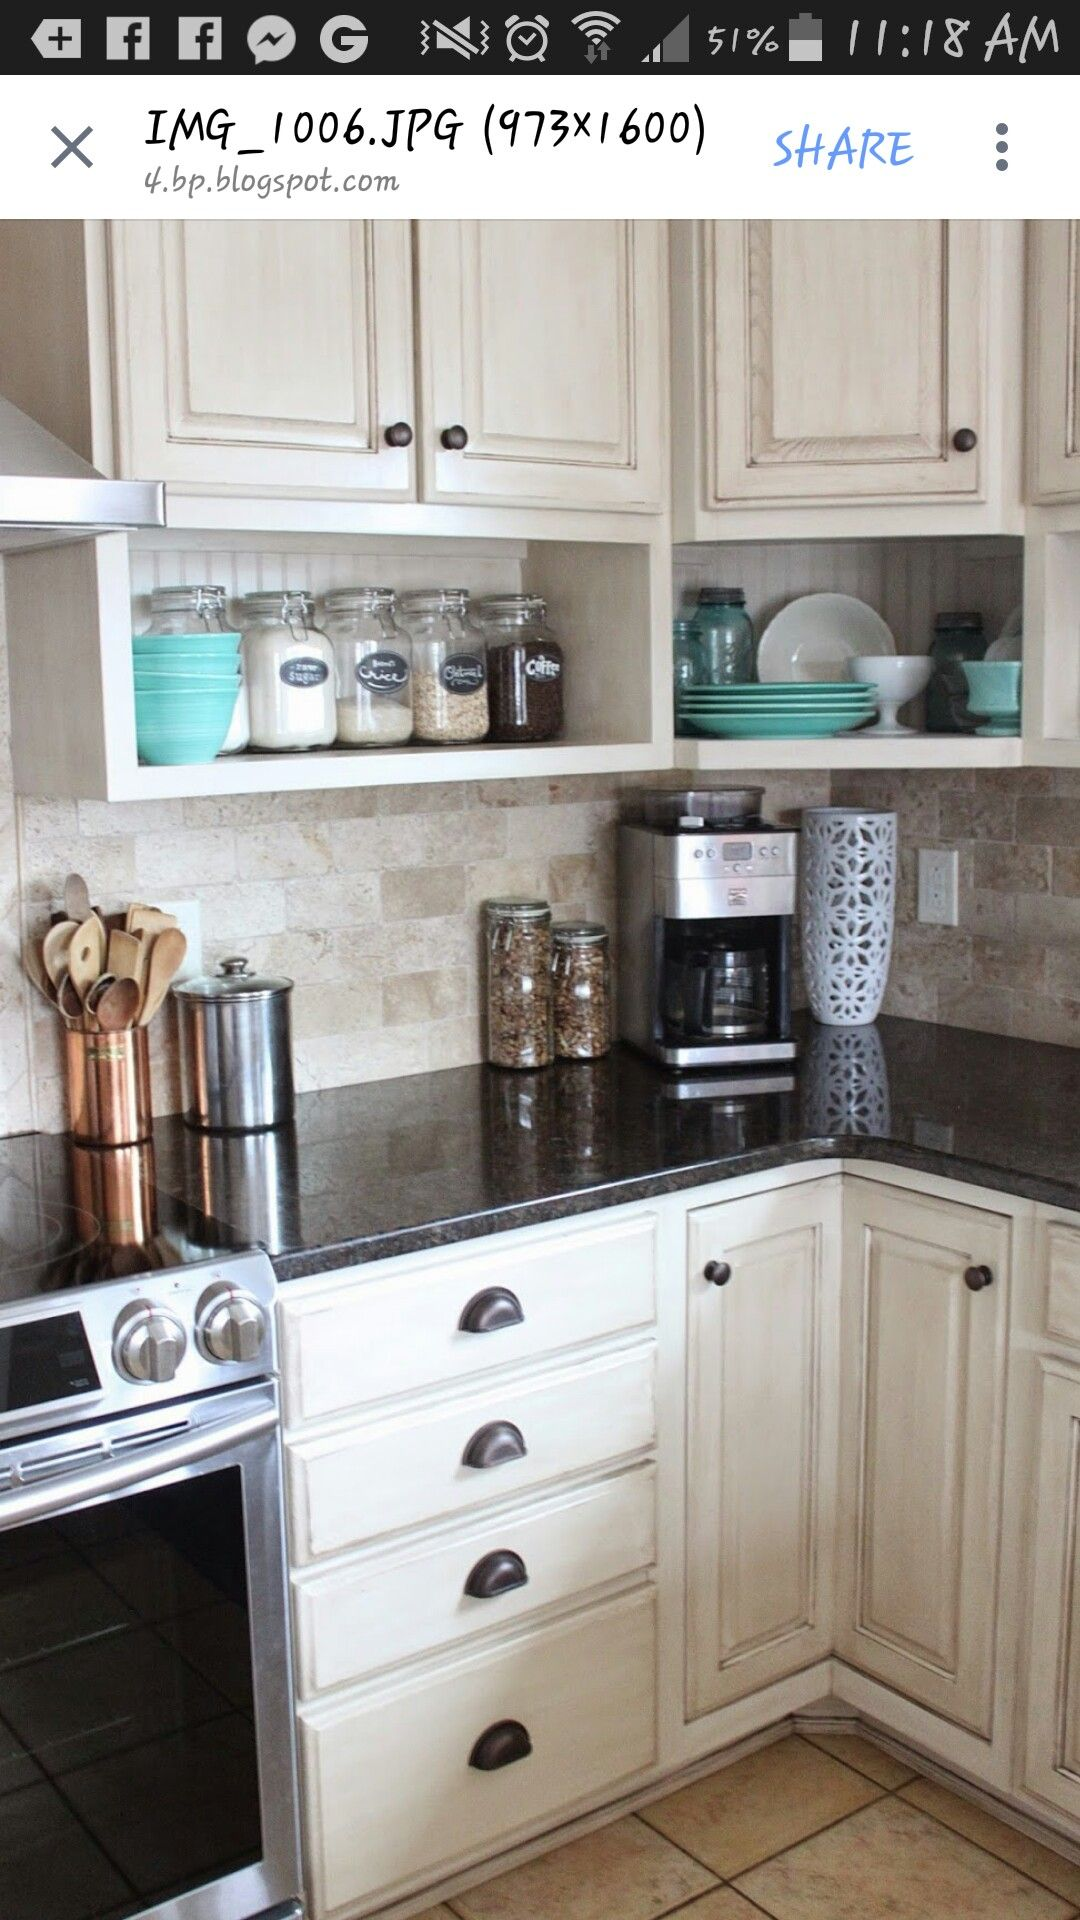 Pin de Karla Martz Jones en kitchen | Pinterest